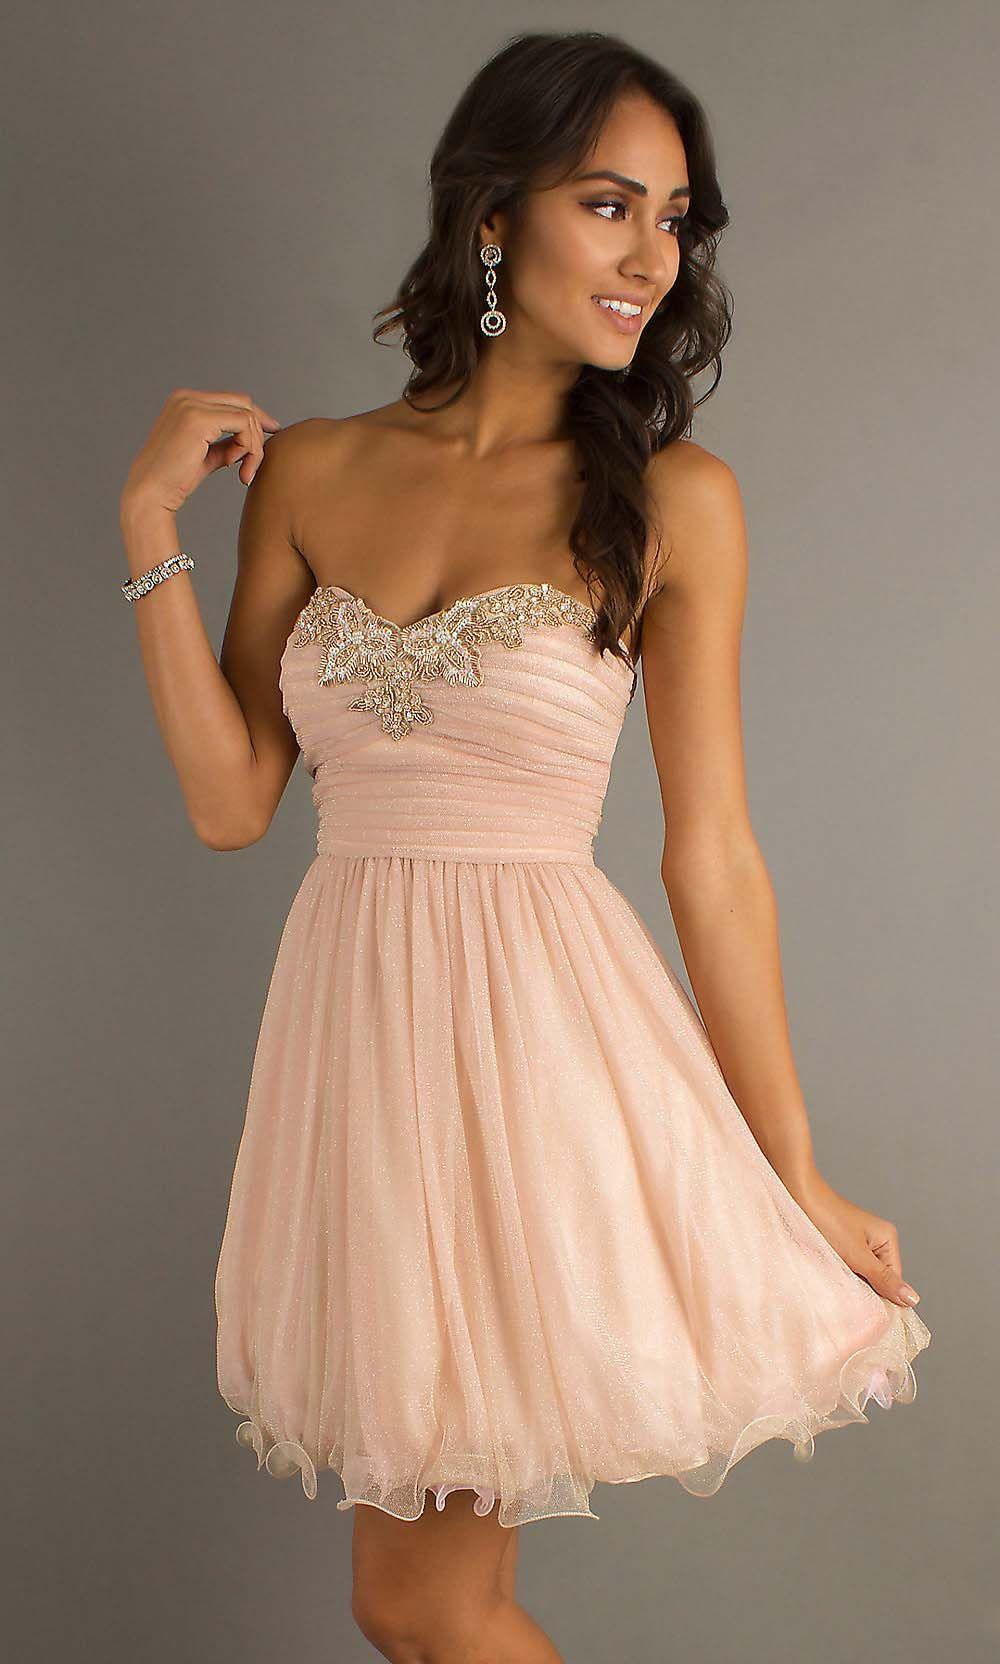 Short blush bridesmaids dresses blush pink chi prom dresses short blush bridesmaids dresses blush pink chi ombrellifo Gallery